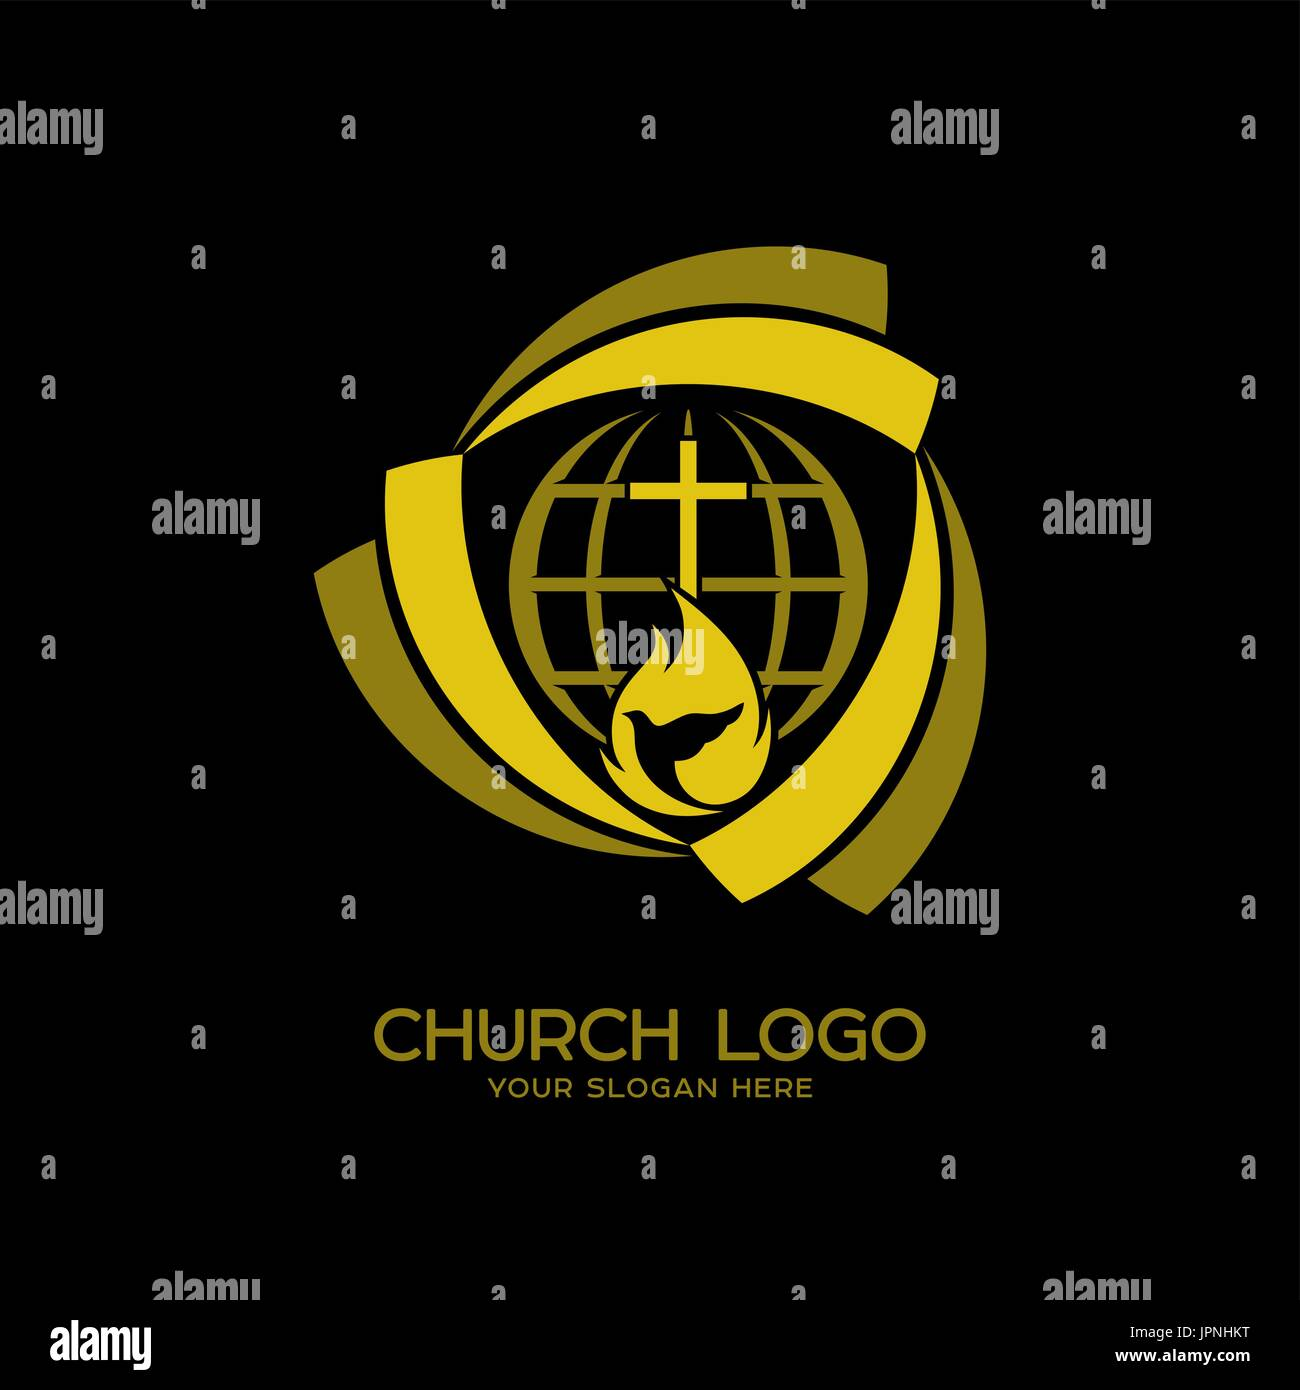 Church Logo Christian Symbols The Cross The Globe And Symbols Of